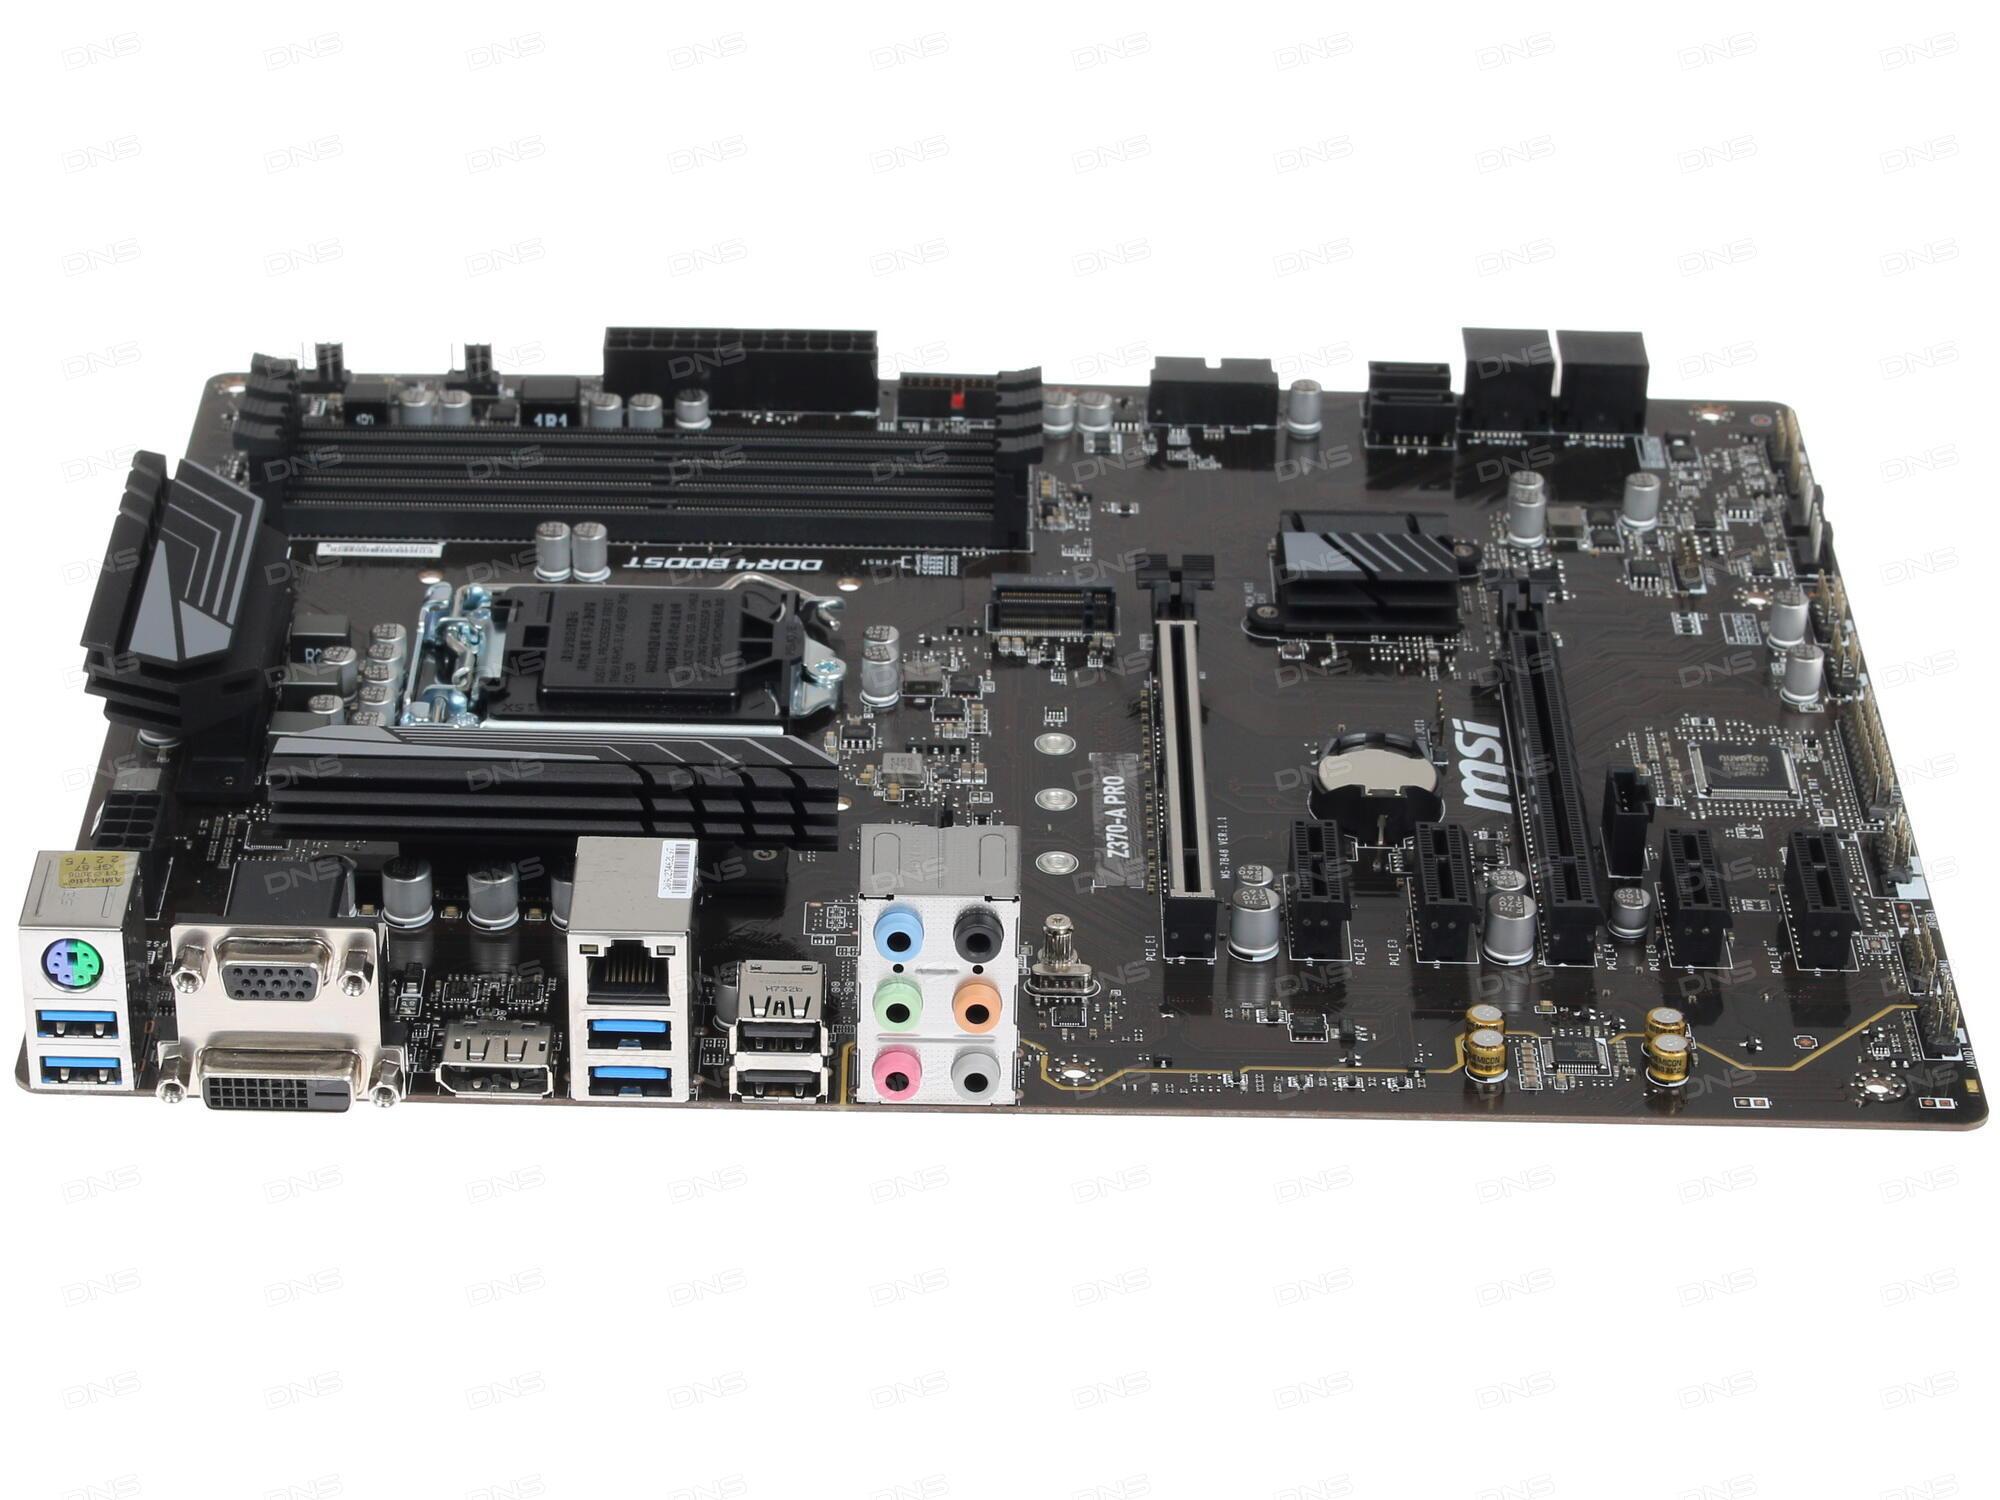 Материнская плата ASRock H110 Pro BTC+ (S1151 iH110 2*DDR4 PCI-E16x 12*PCI-E1x DVI SATAIII M.2 GB Lan USB3.0 ATX Retail)